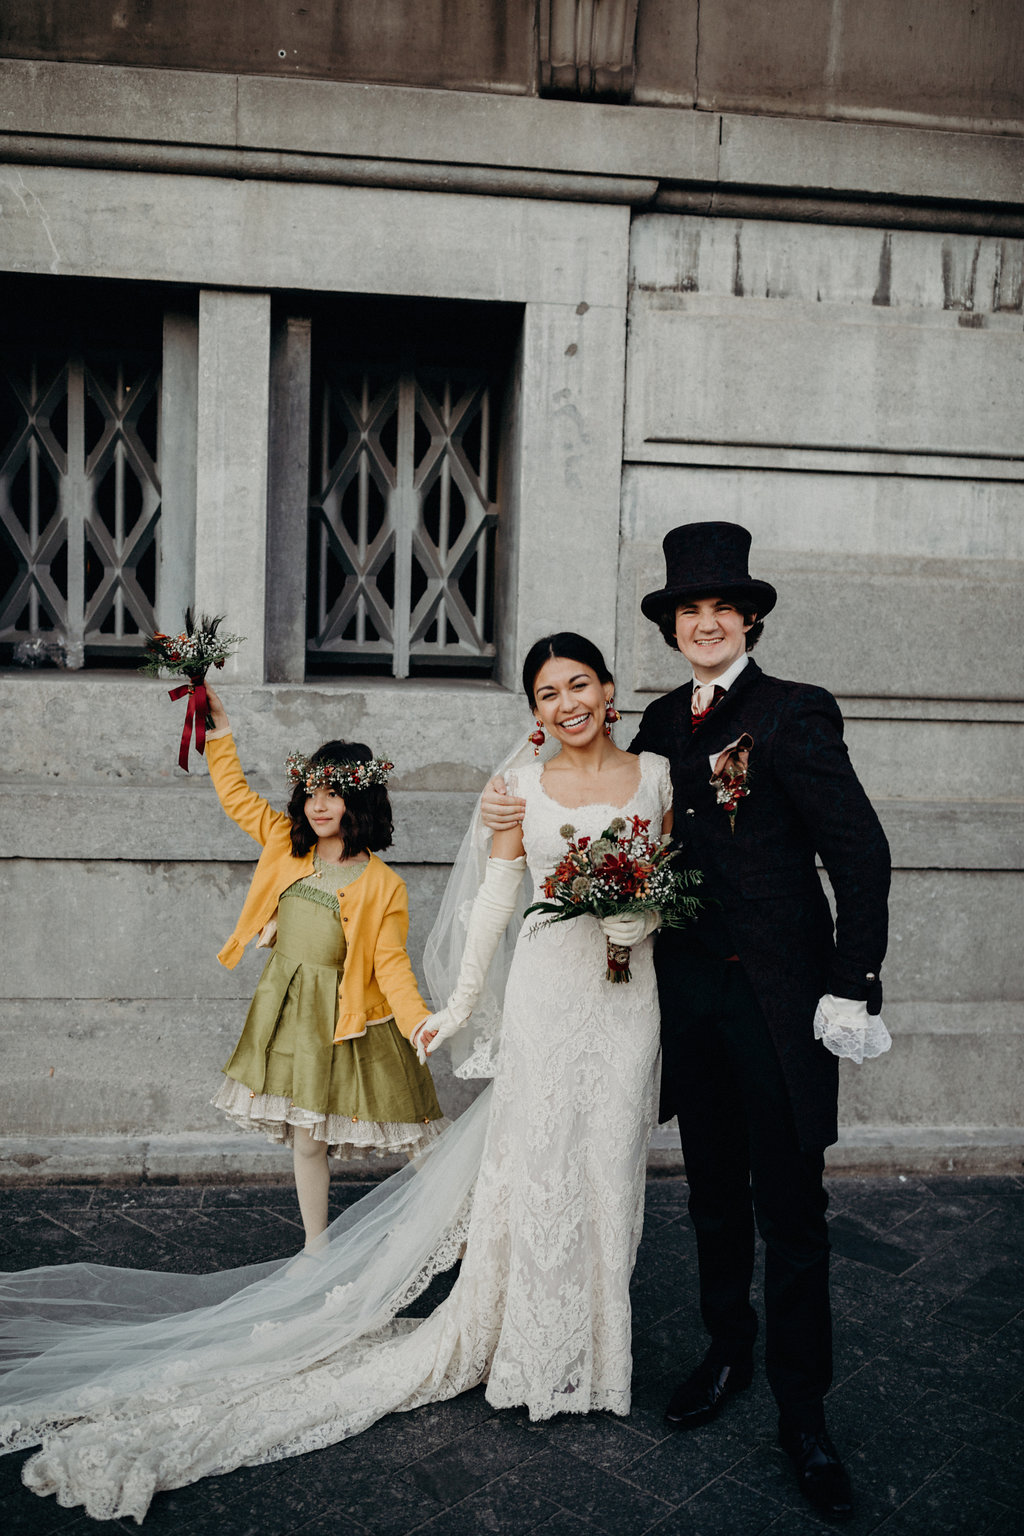 294-sjoerdbooijphotography-wedding-coen-janaina.jpg